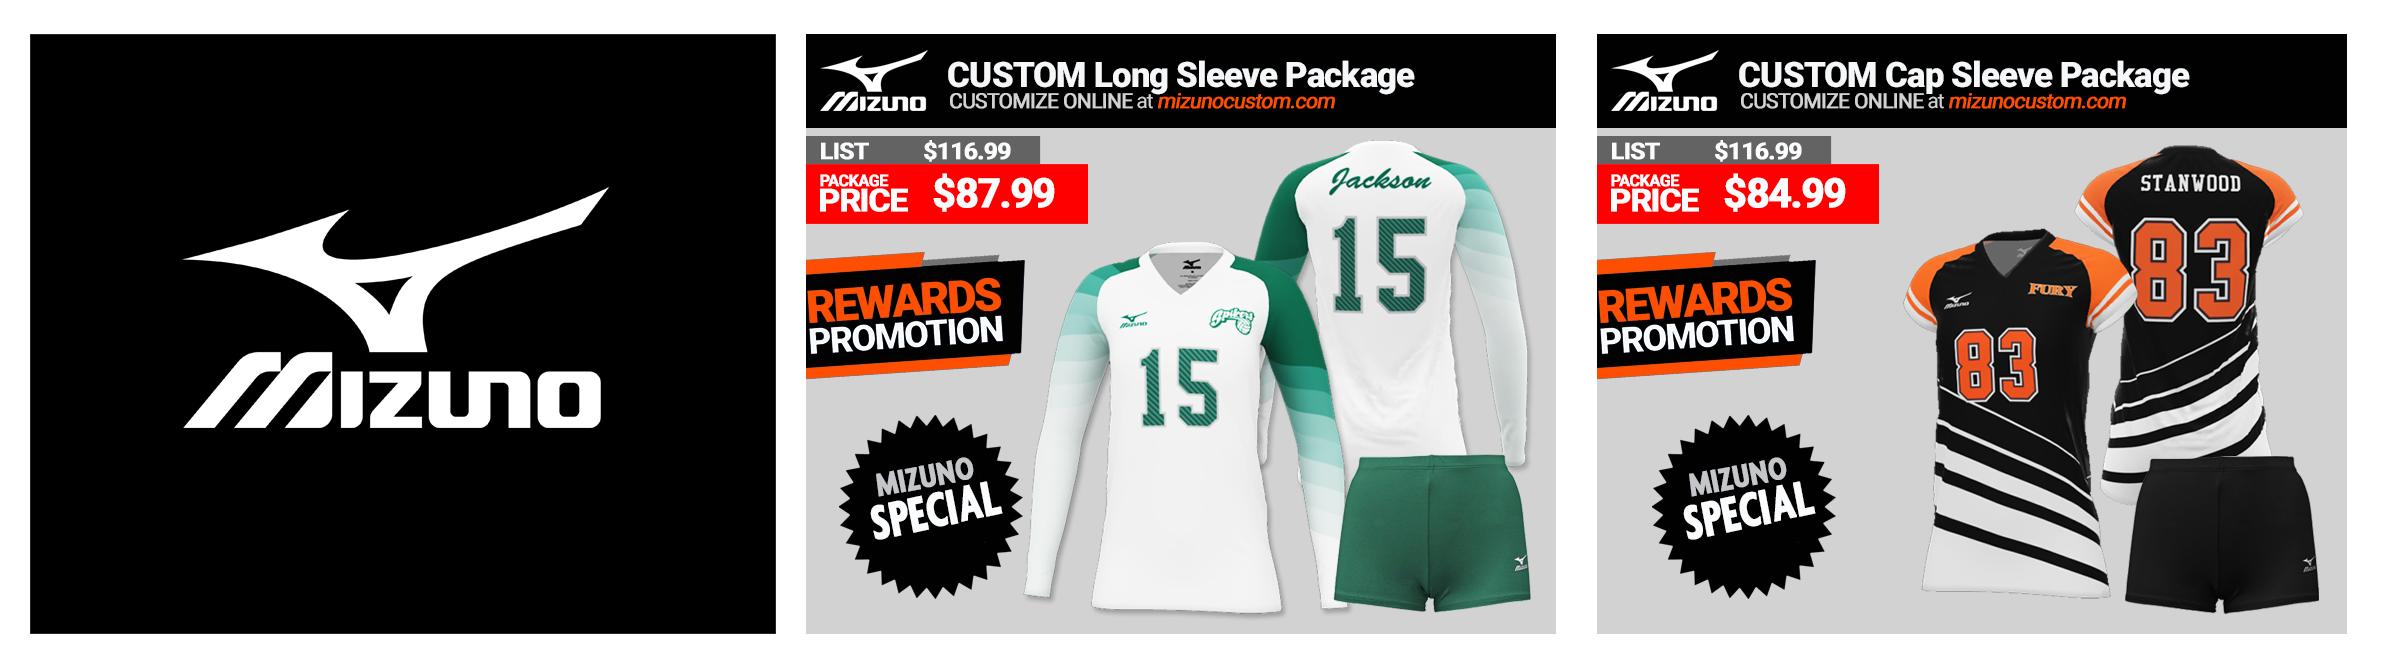 mizuno long beach volleyball club website examples student uniforms